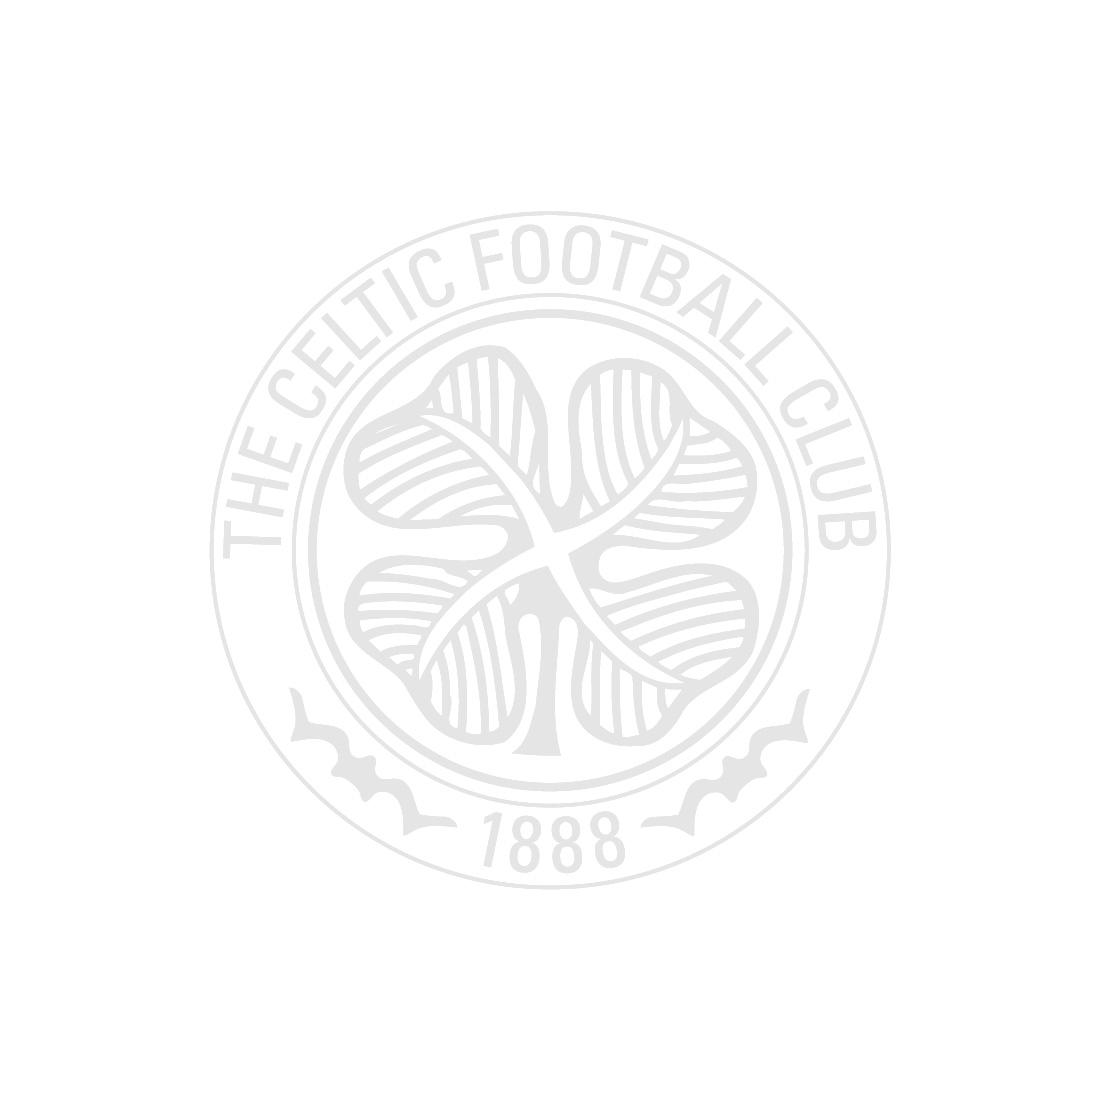 Celtic Essentials Raised Print T-shirt